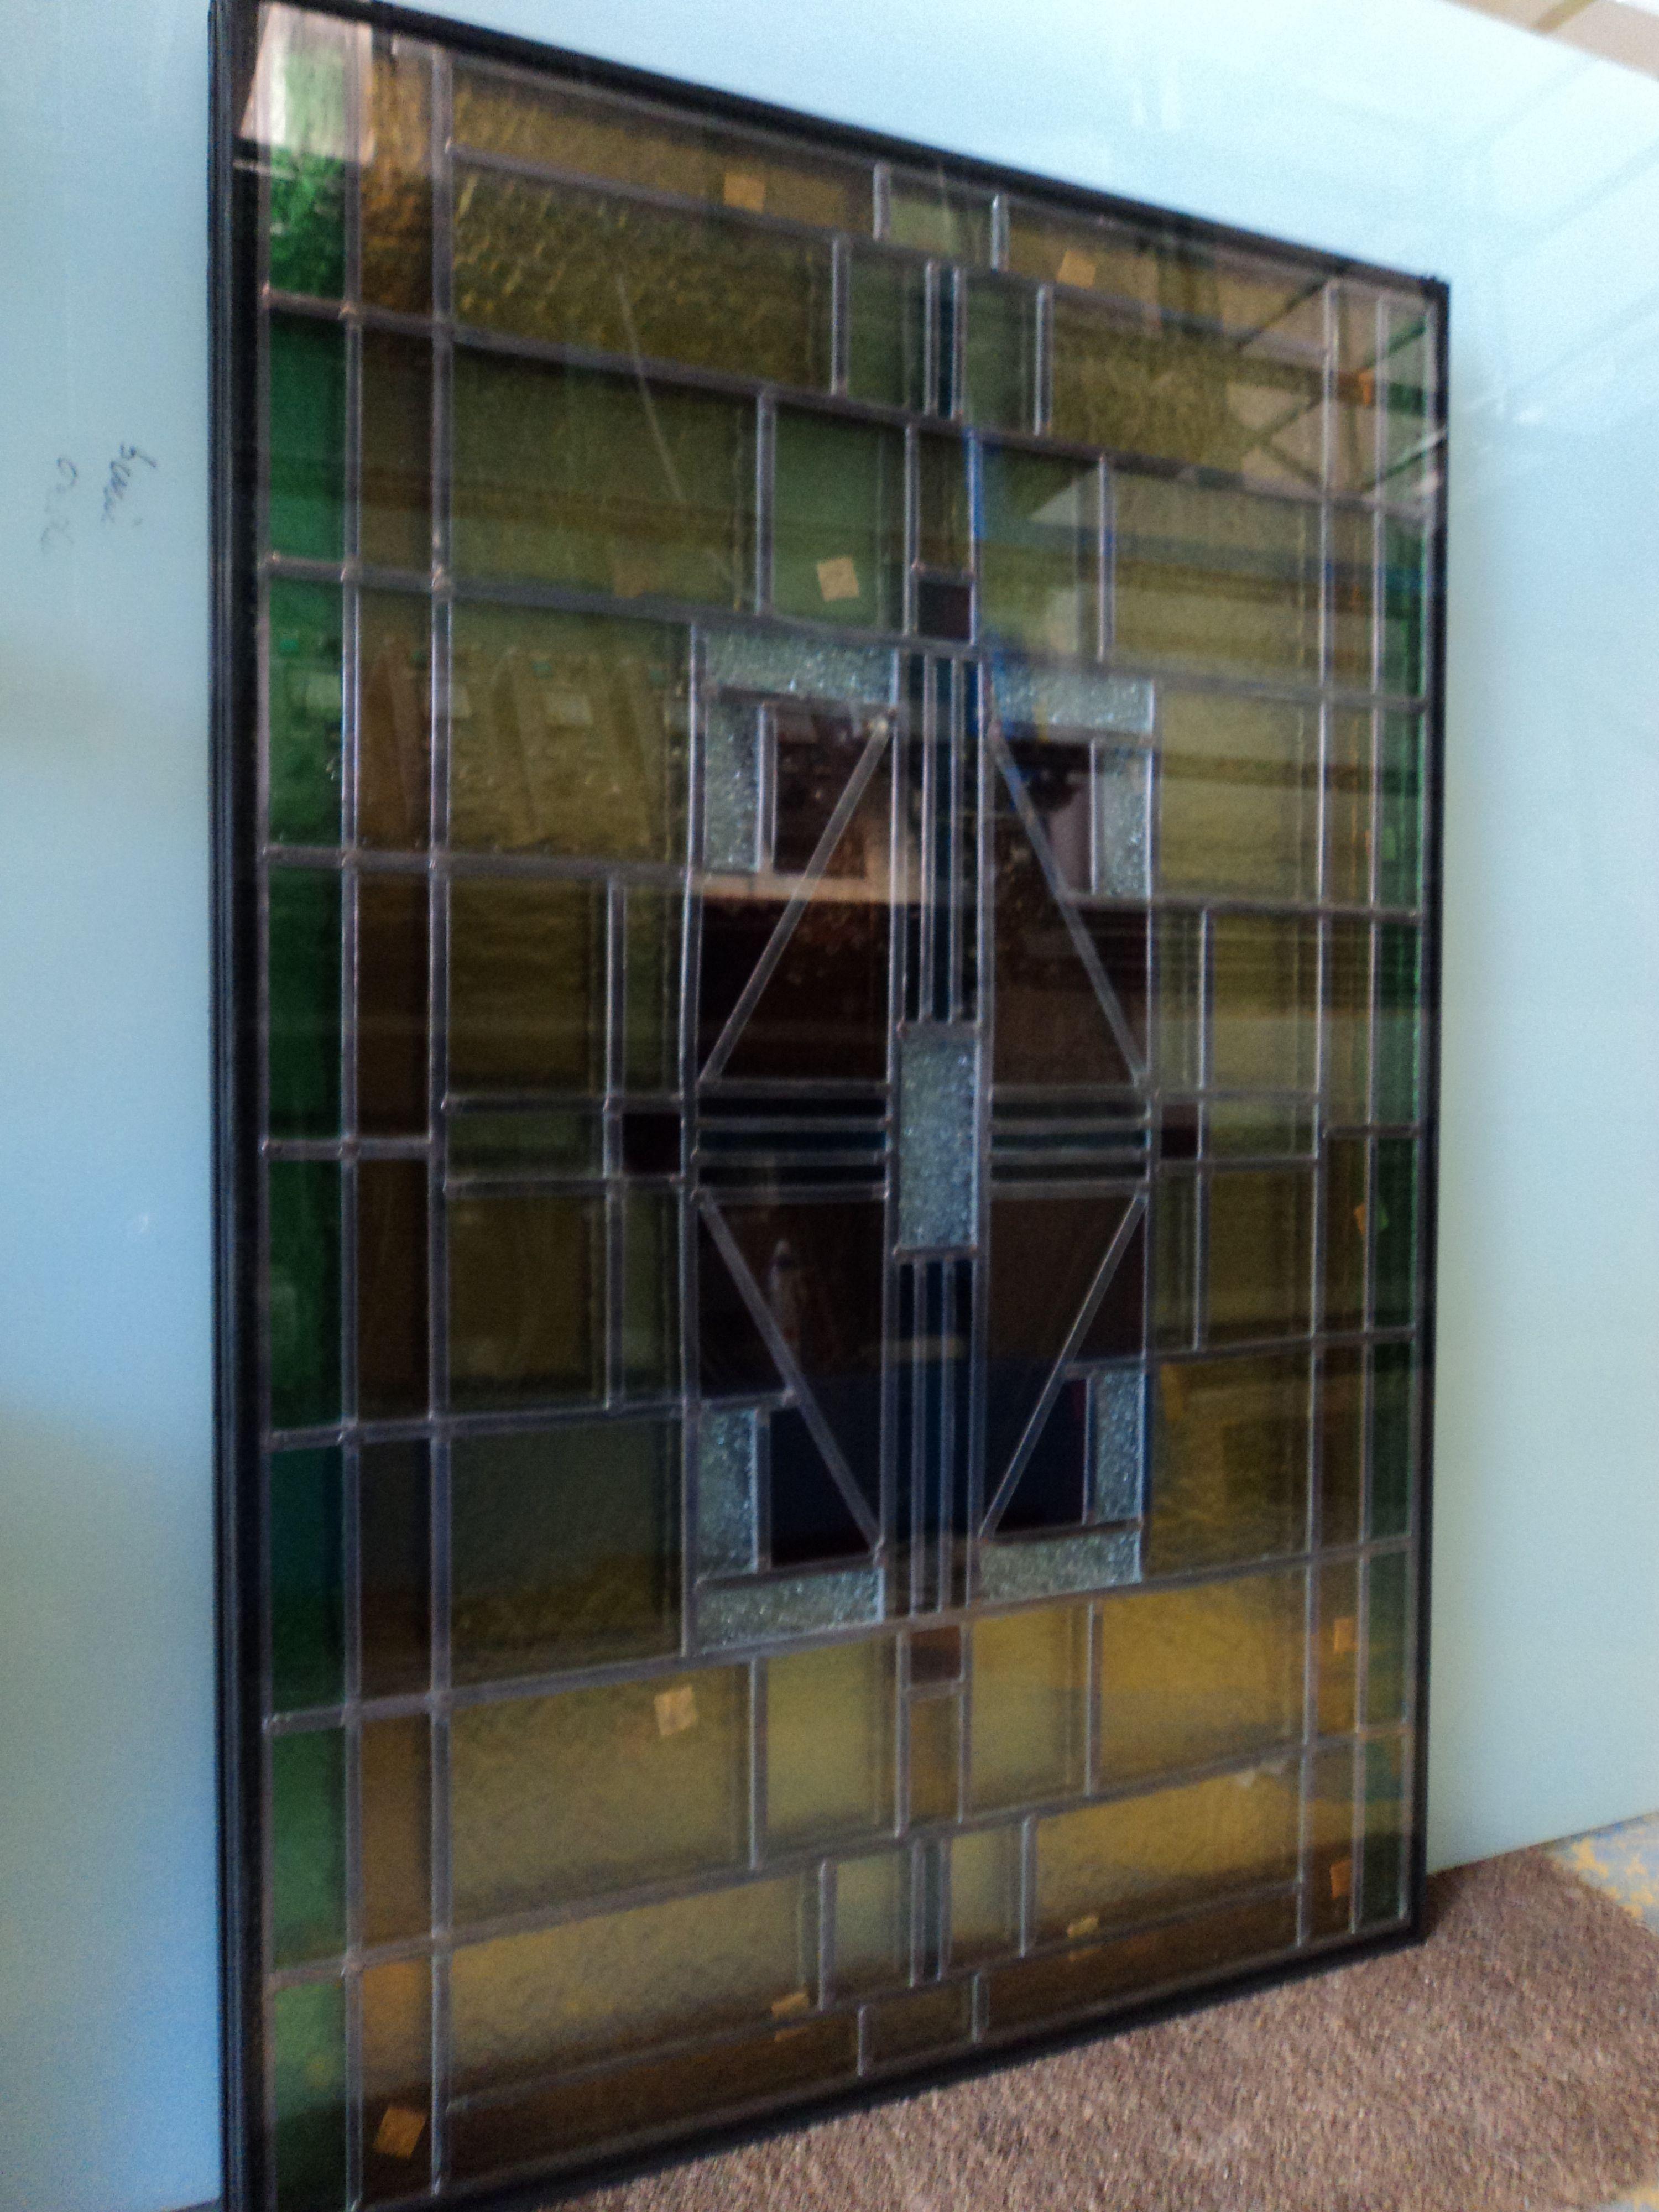 Glas Den Haag.Glas In Lood In Dubbel Glas Bij Ariba Glashandel Den Haag